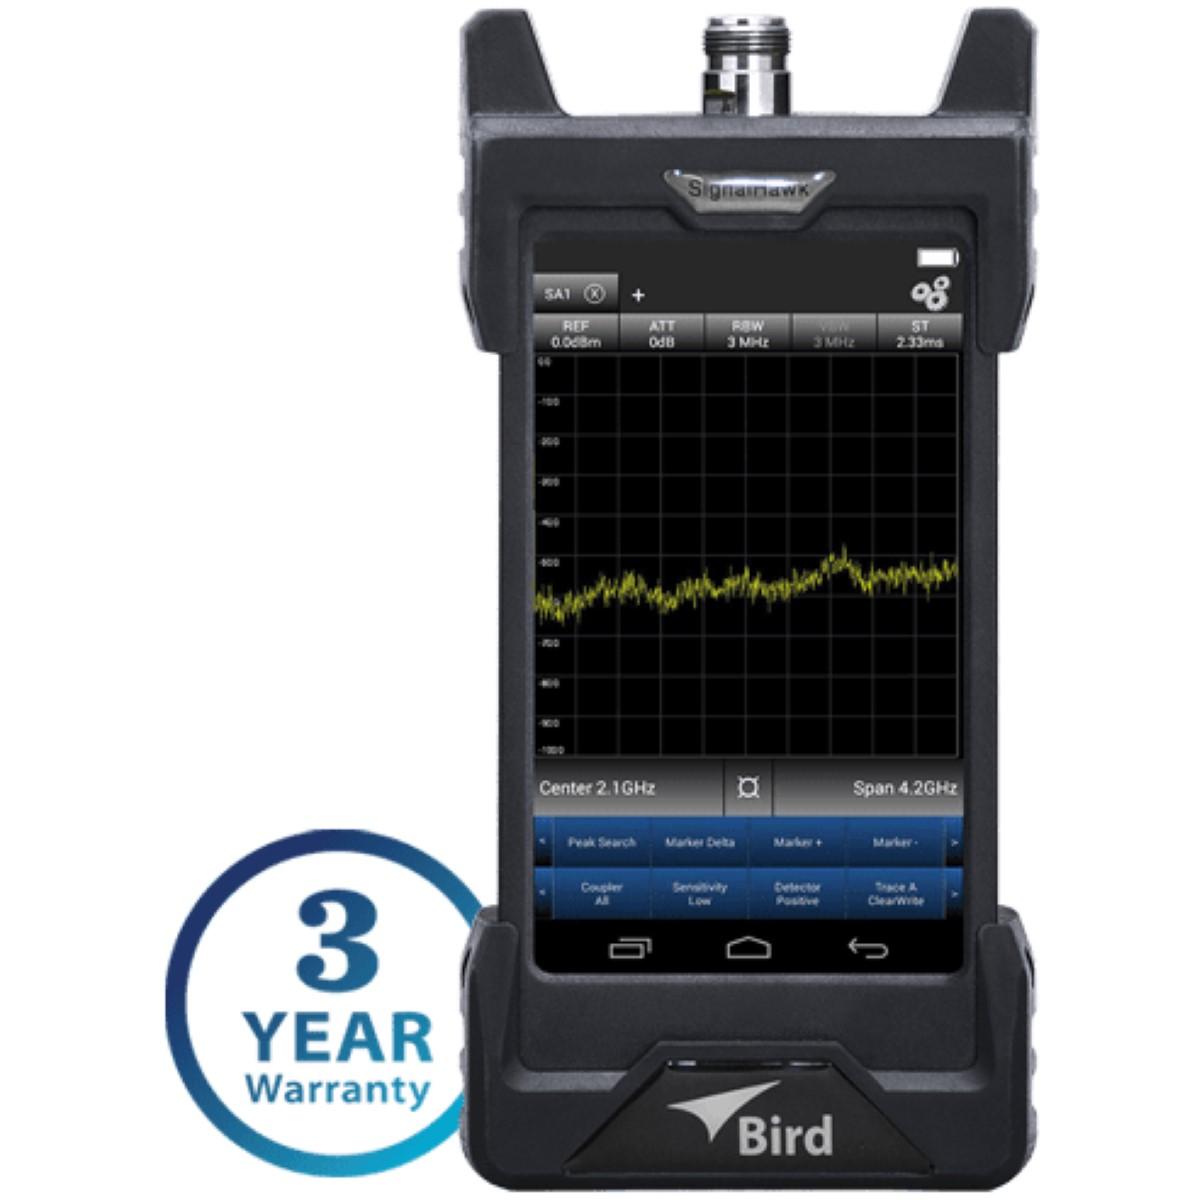 Analizador de Espectro BIRD RF SH-42S-TC Signal Hawk